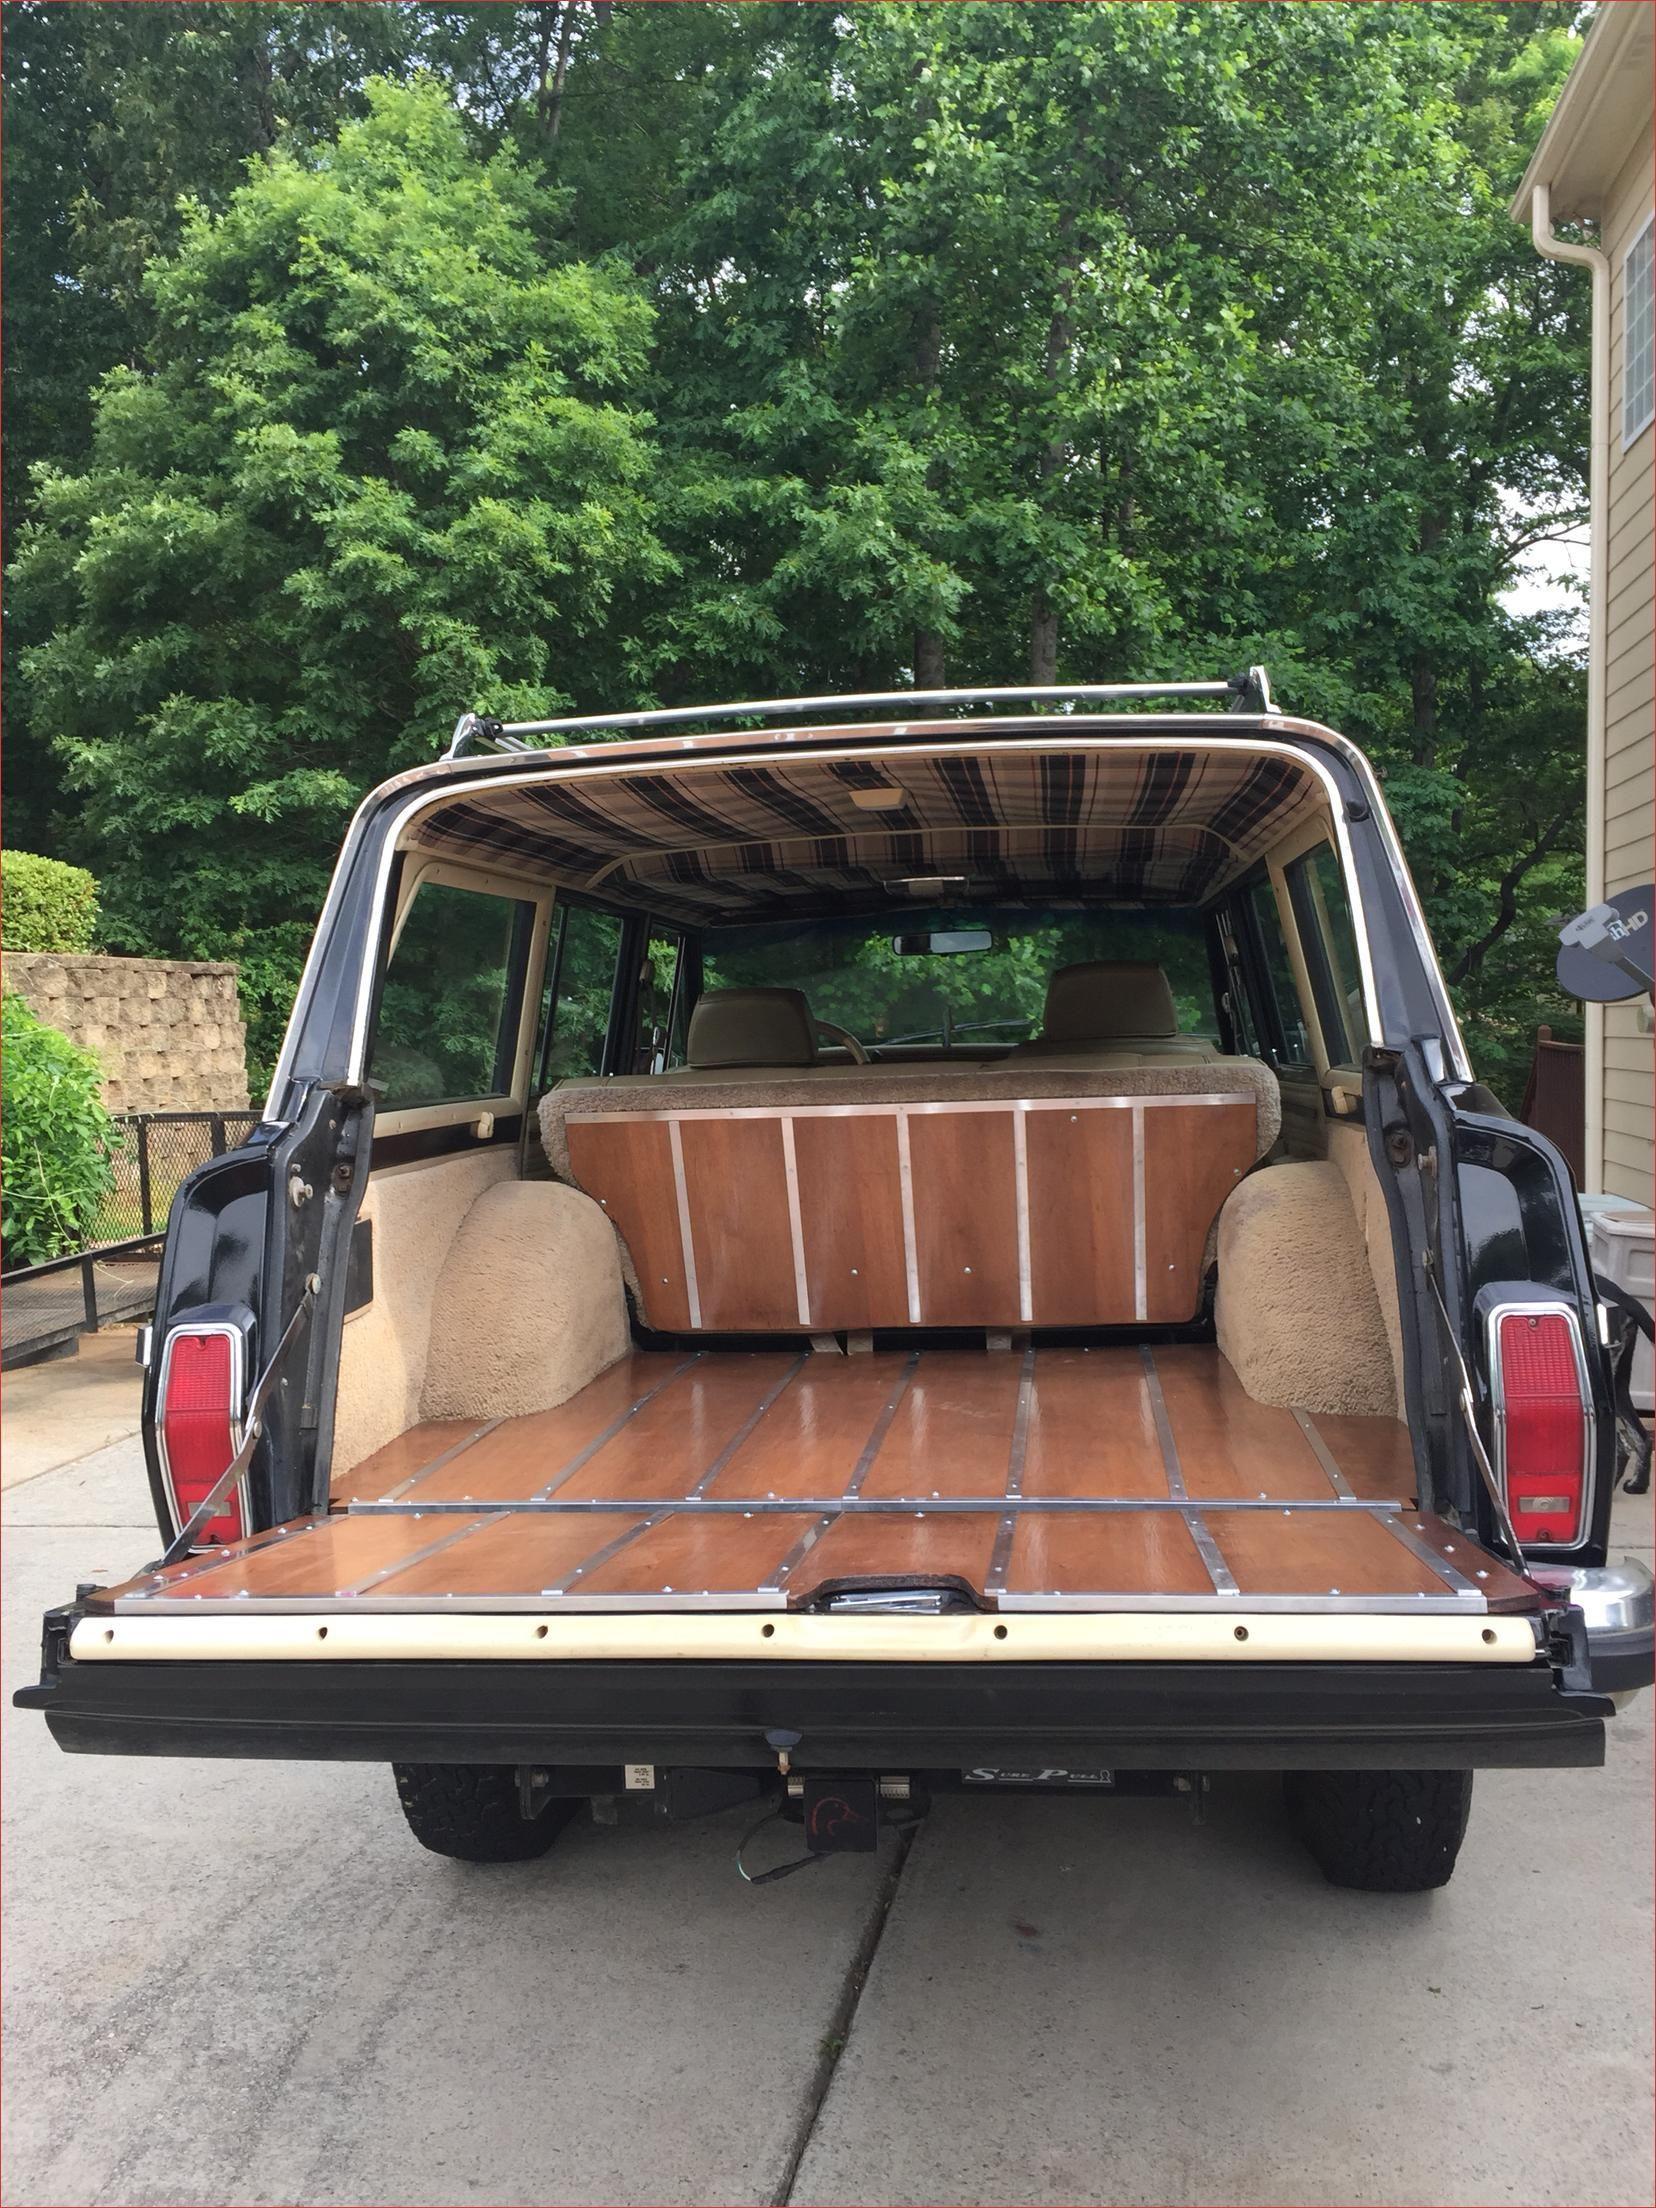 New Vintage Jeep Wagoneer Wood Paneling We Otomotive Info Jeep Wagoneer Vintage Jeep Classic Chevy Trucks